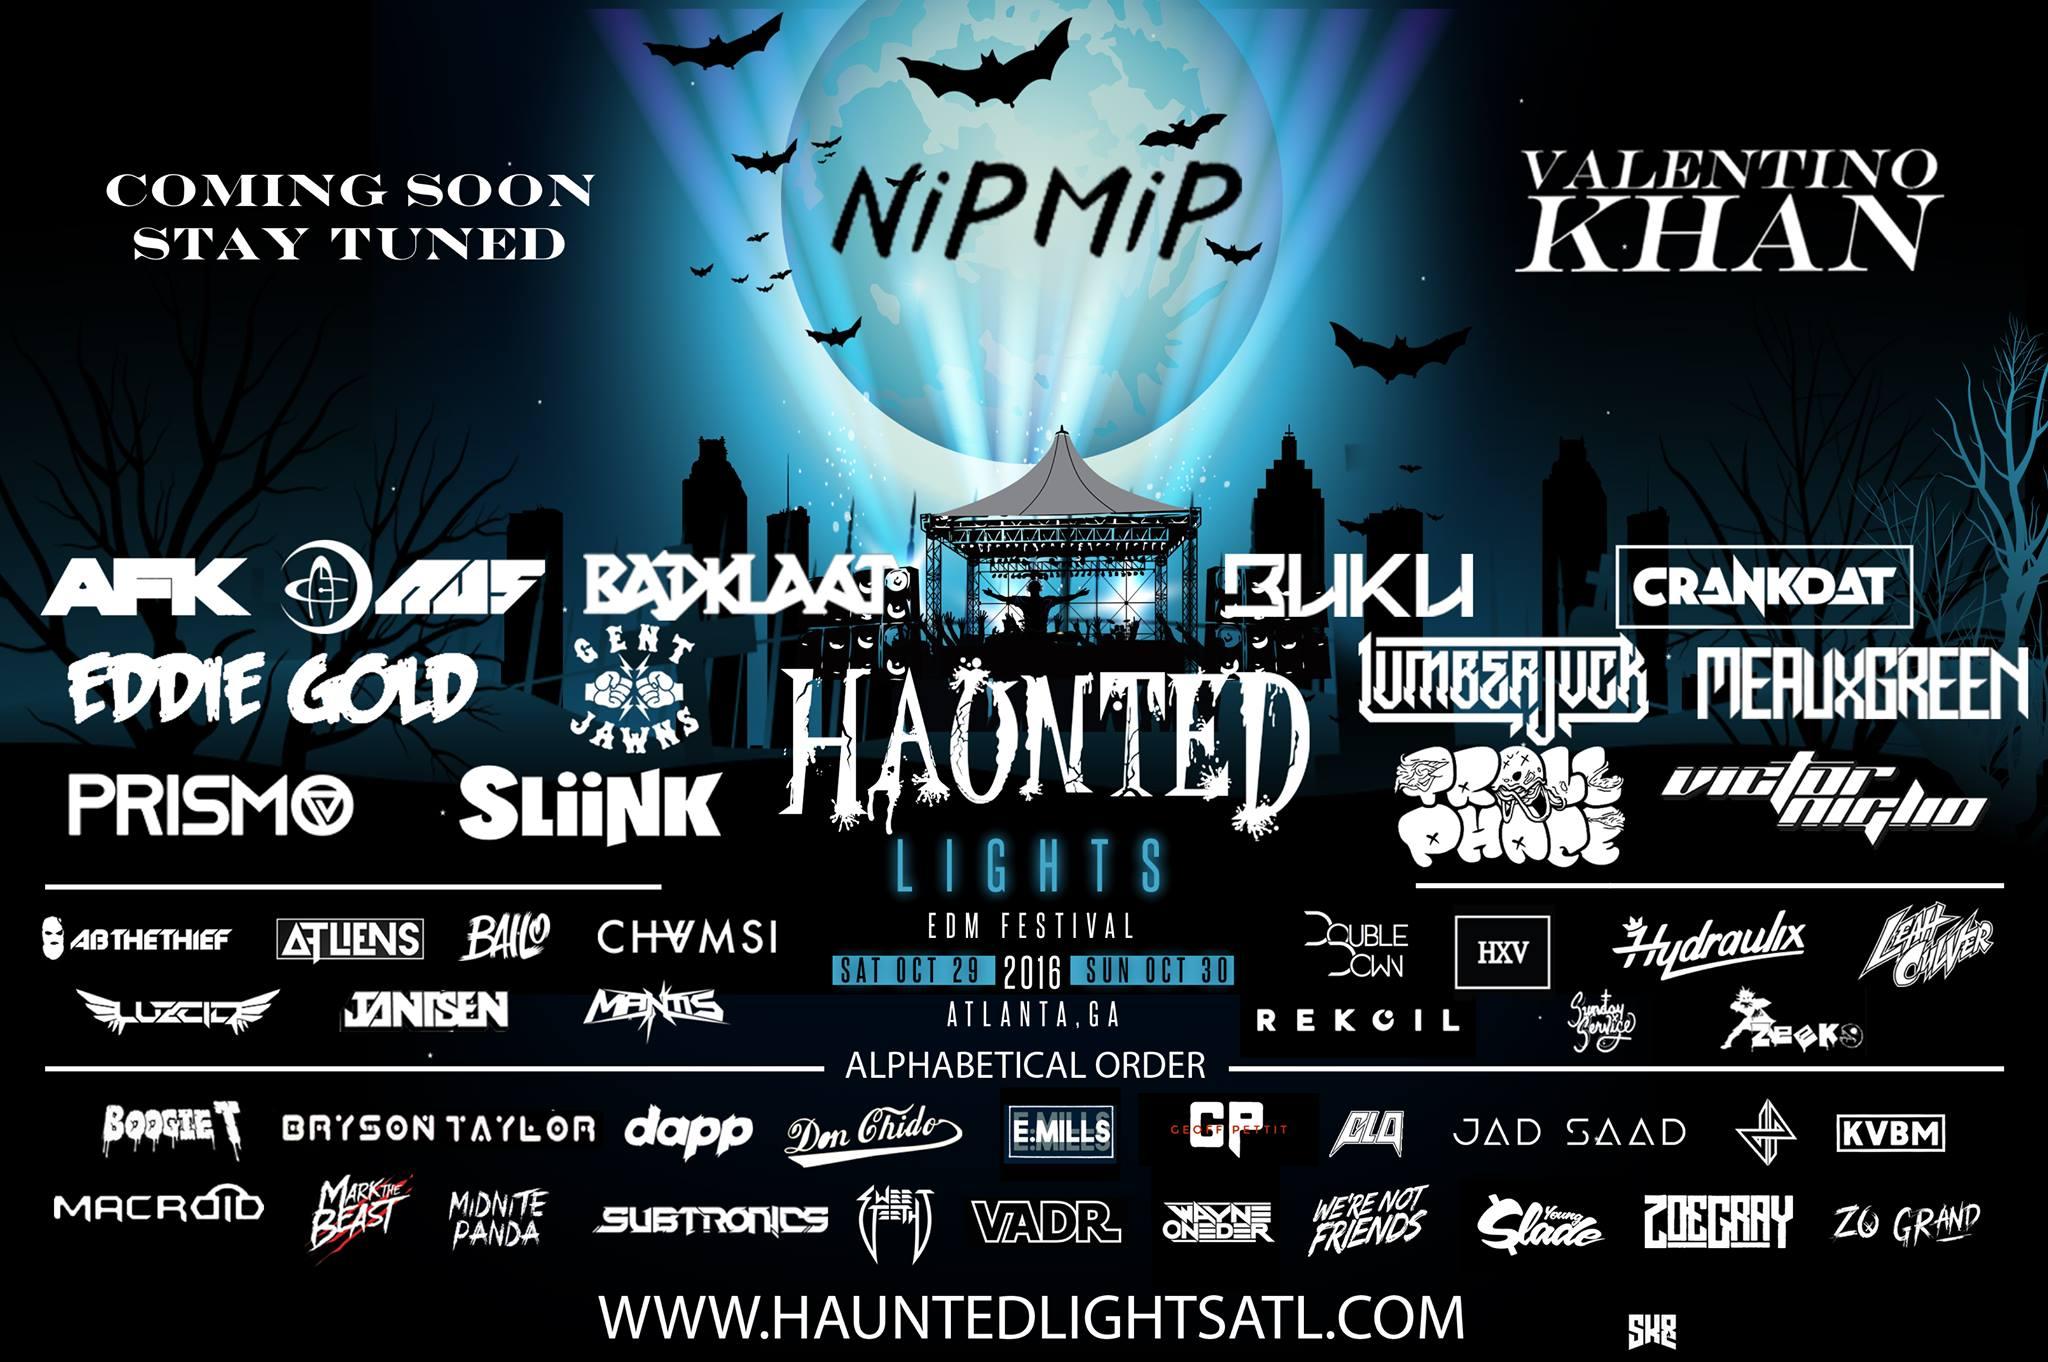 hauntedlights